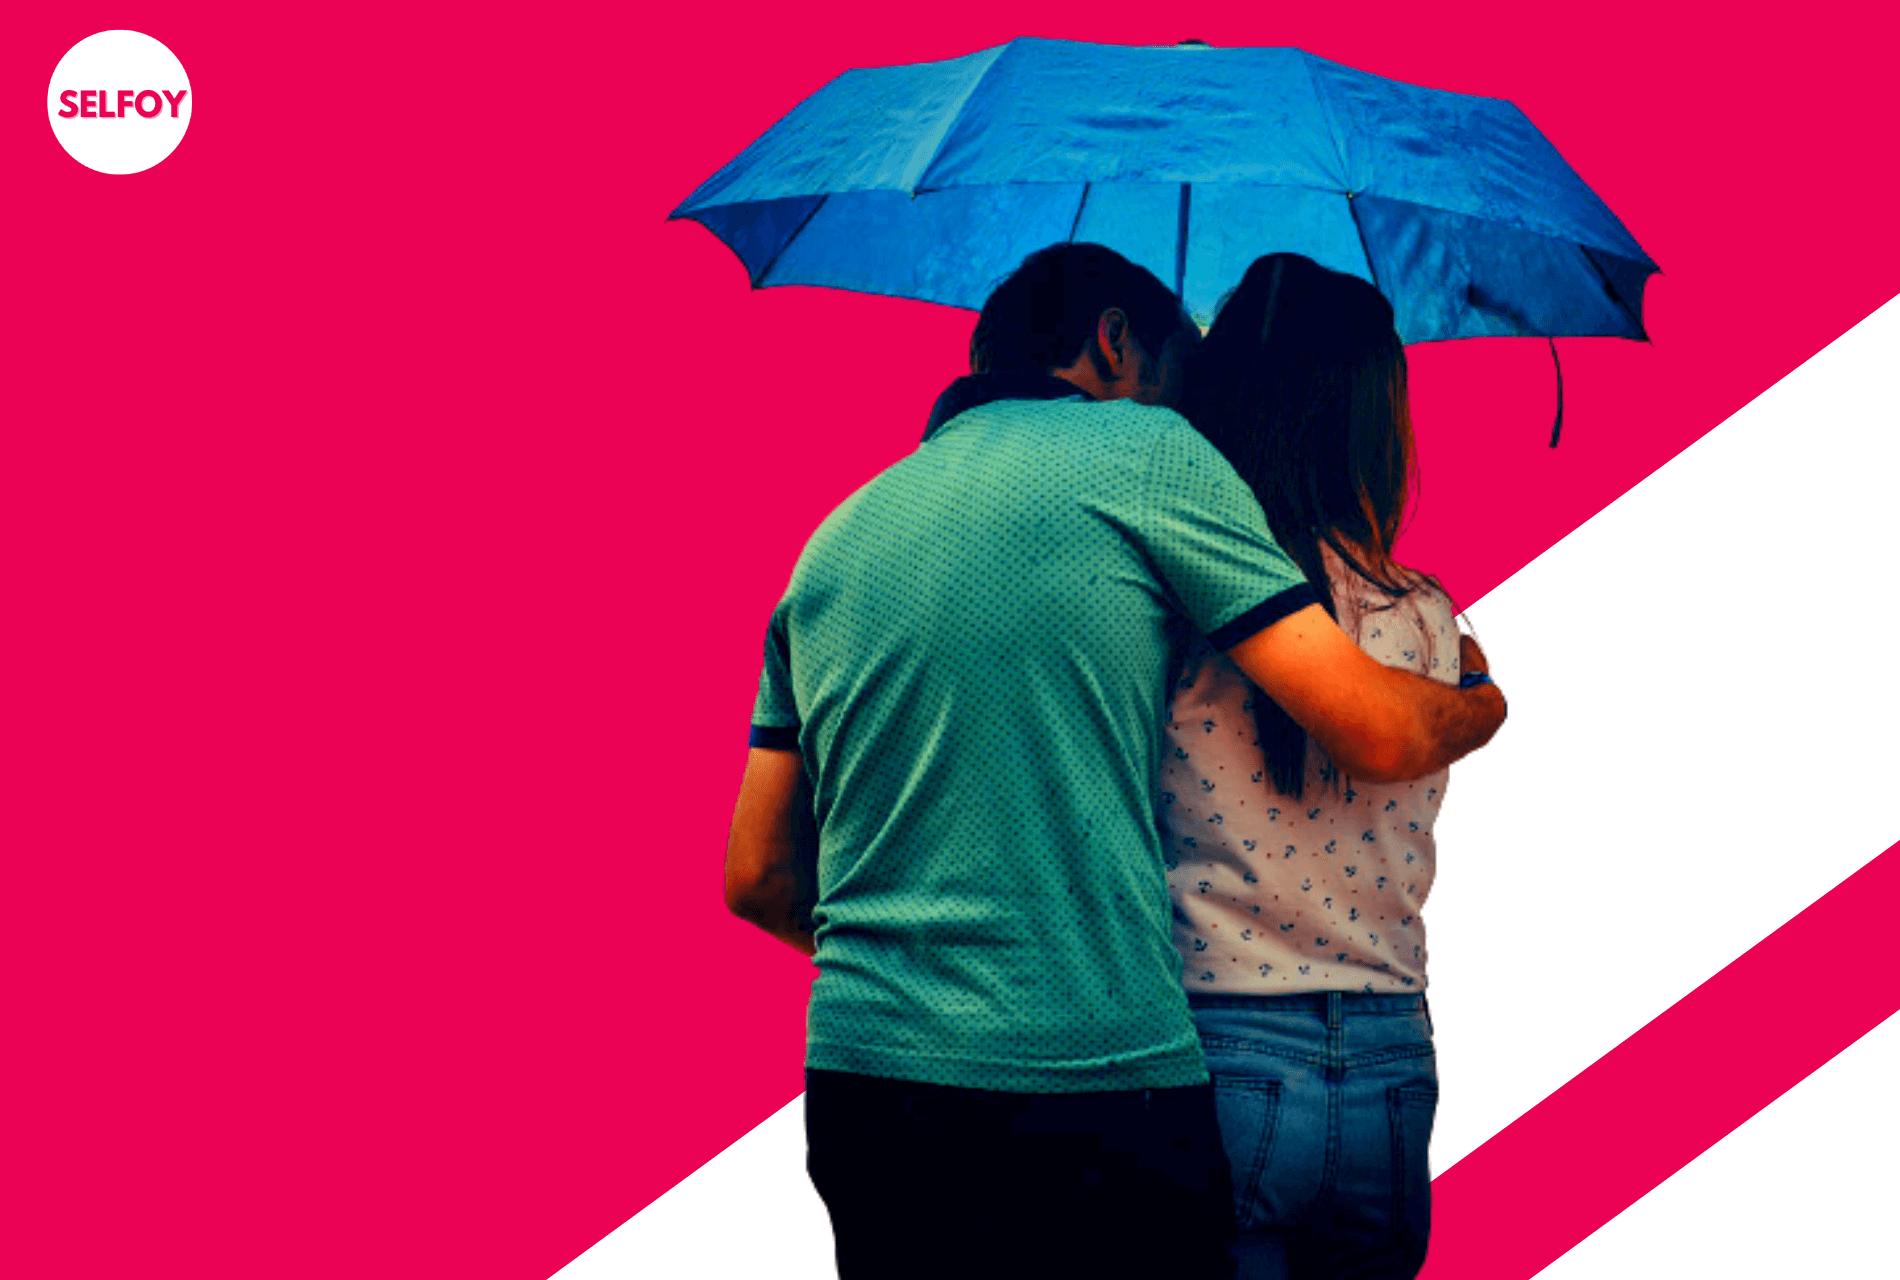 Why-does-being-in-love-feel-so-good-Man-cuddling-woman-under-umbrella